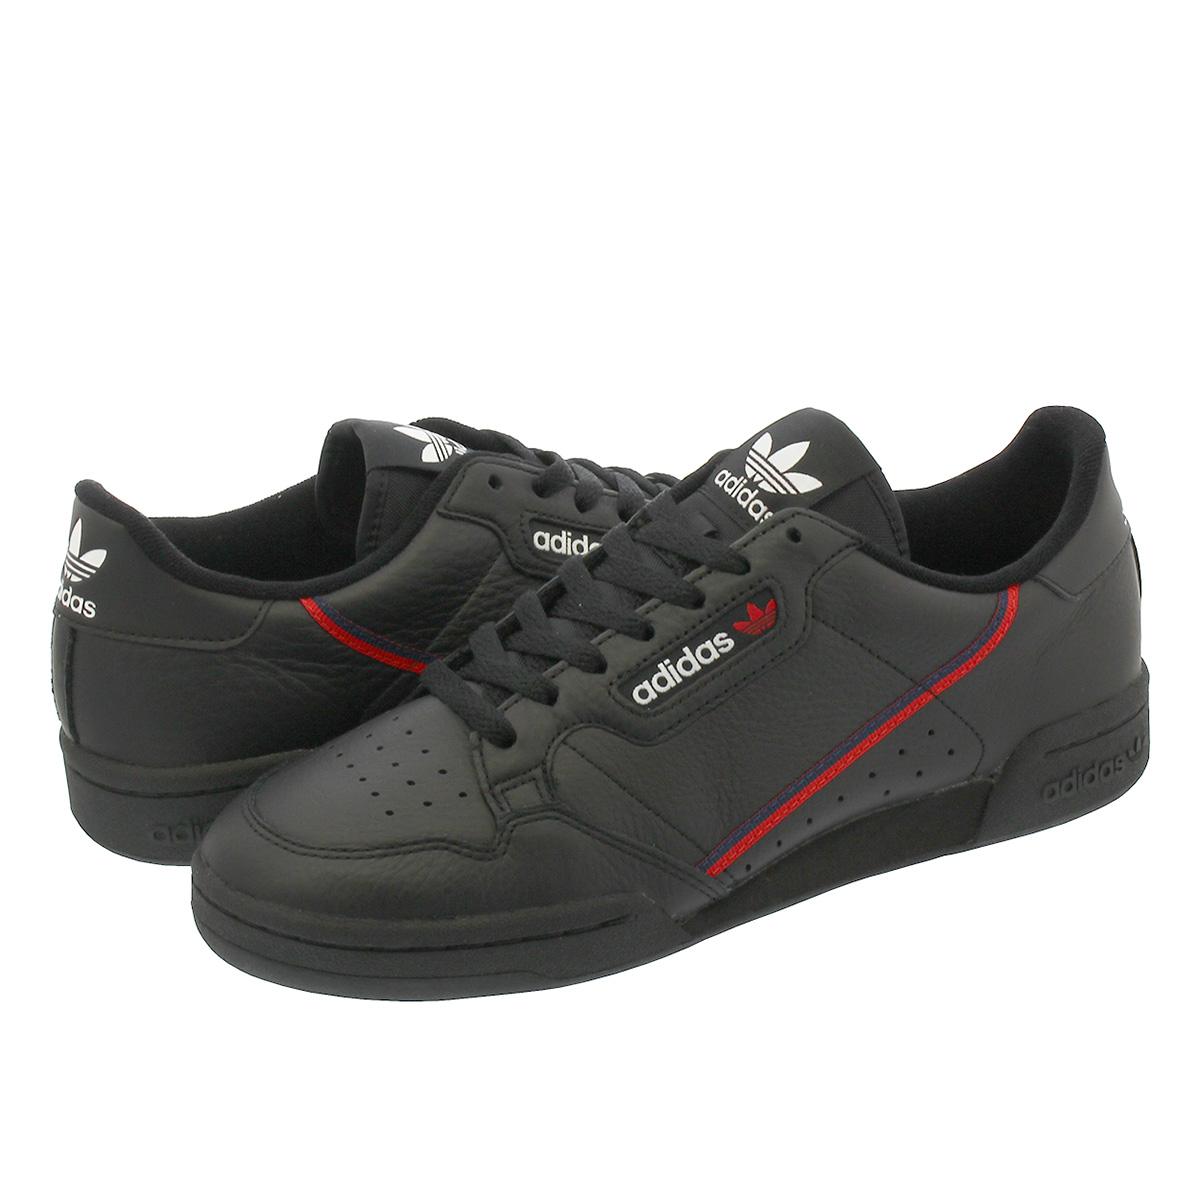 the latest 7bf78 e0f37 SELECT SHOP LOWTEX adidas CONTINENTAL 80 Adidas Continental 80 CORE  BLACKSCARLETCOLLEGIATE NAVY b41672  Rakuten Global Market